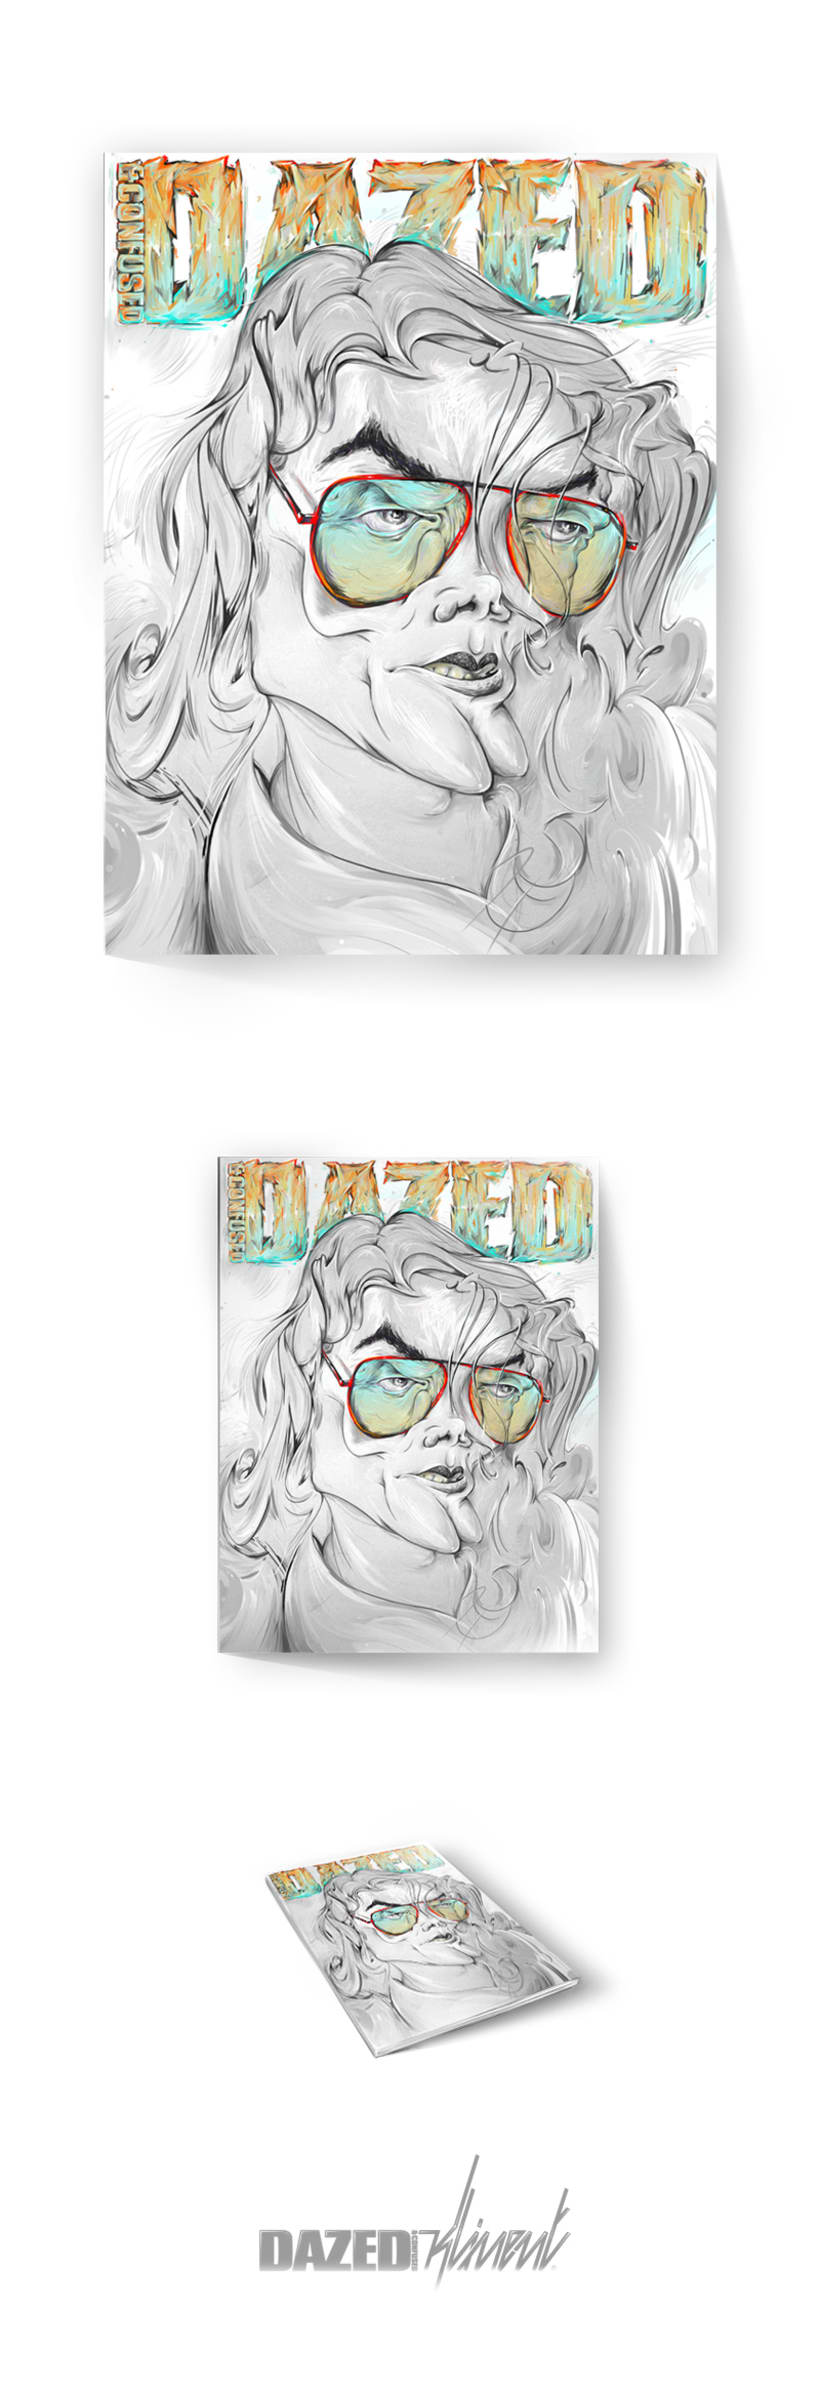 Dazed Decade Drawn Out 1